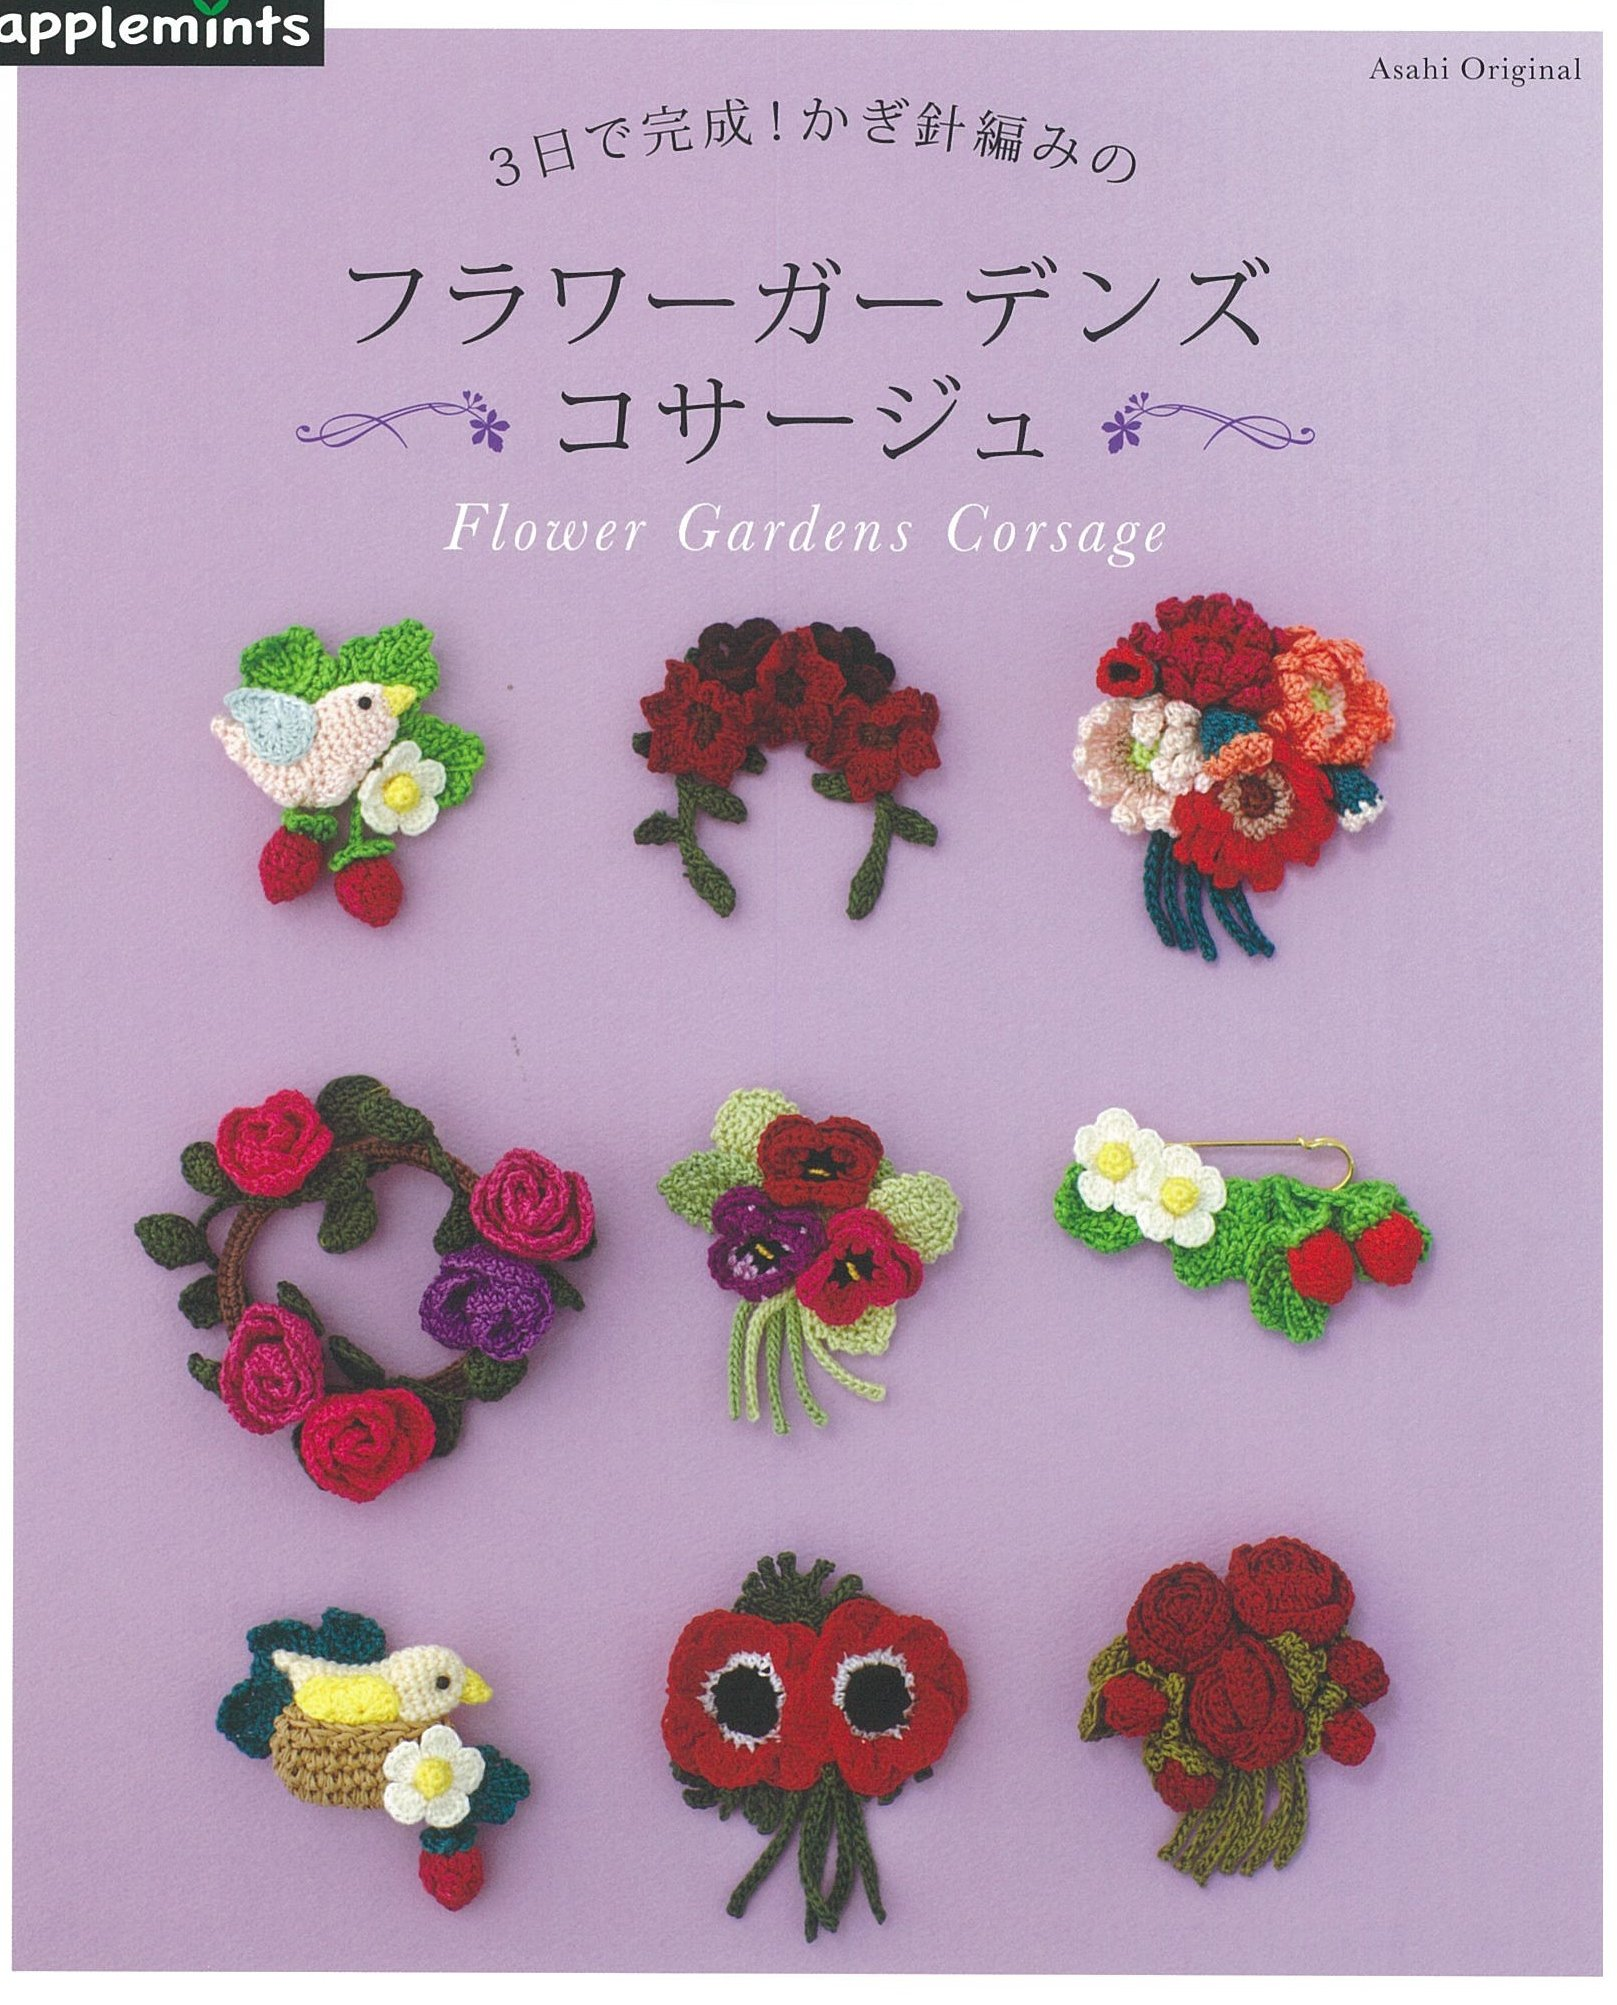 Crochet Flower Gardens corsage